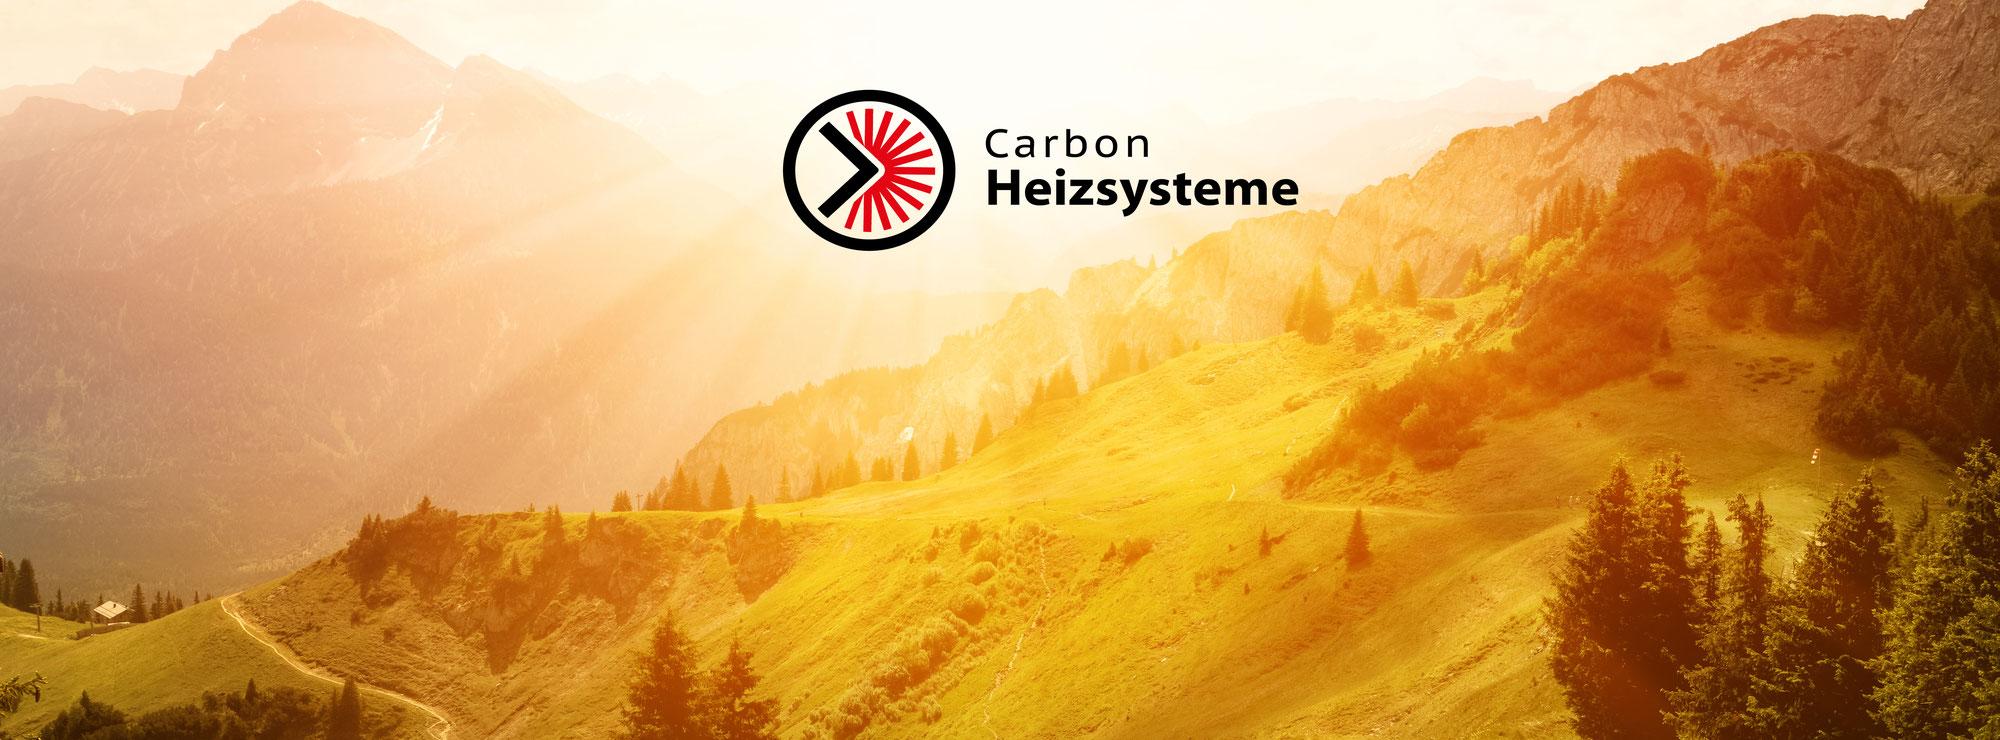 Carbon Heizsysteme - Carbon Heizsysteme